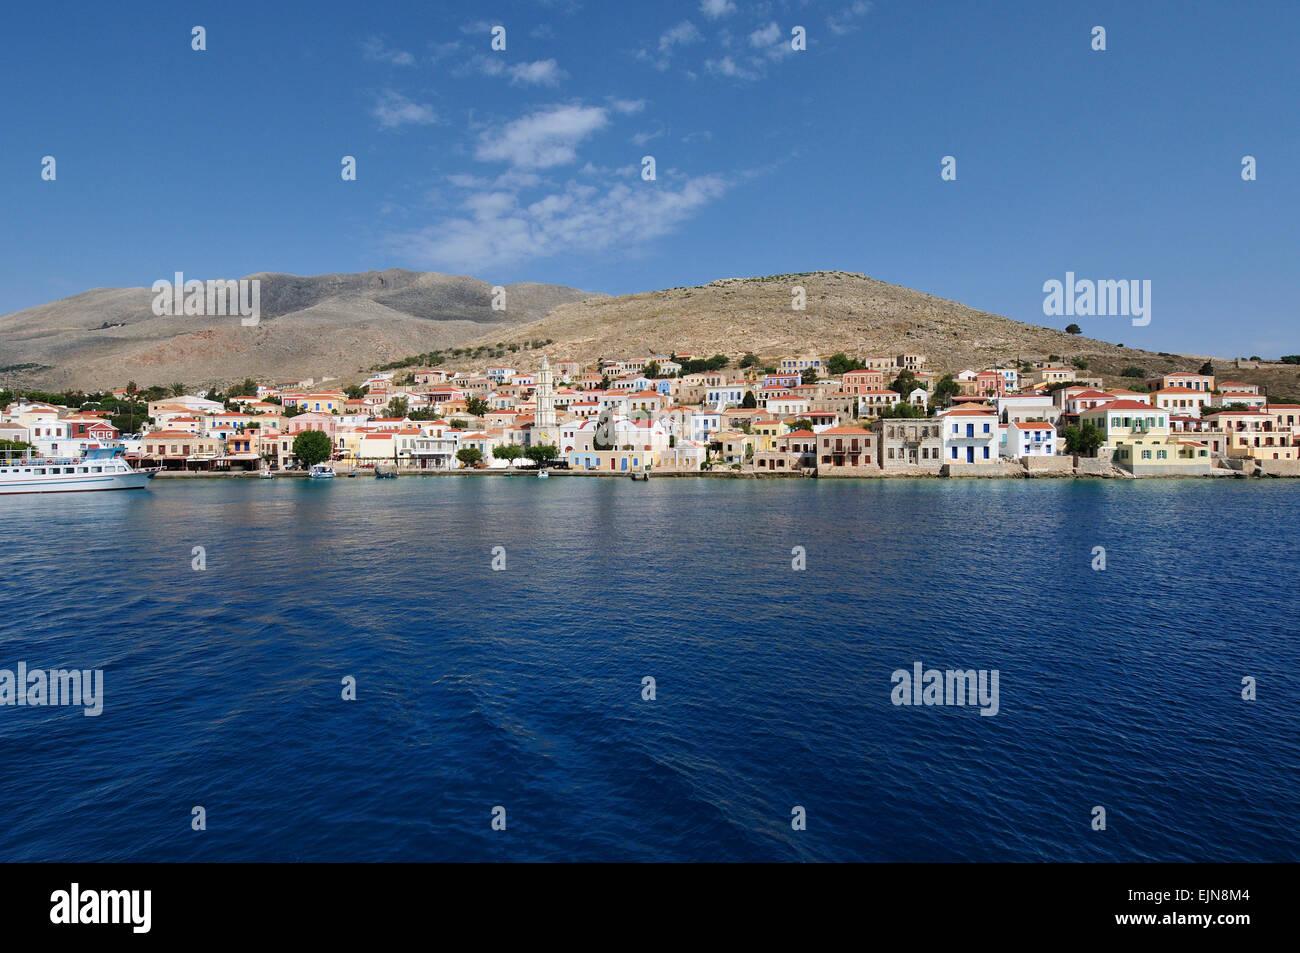 Halki. Greece. View of the port village Emporio. - Stock Image